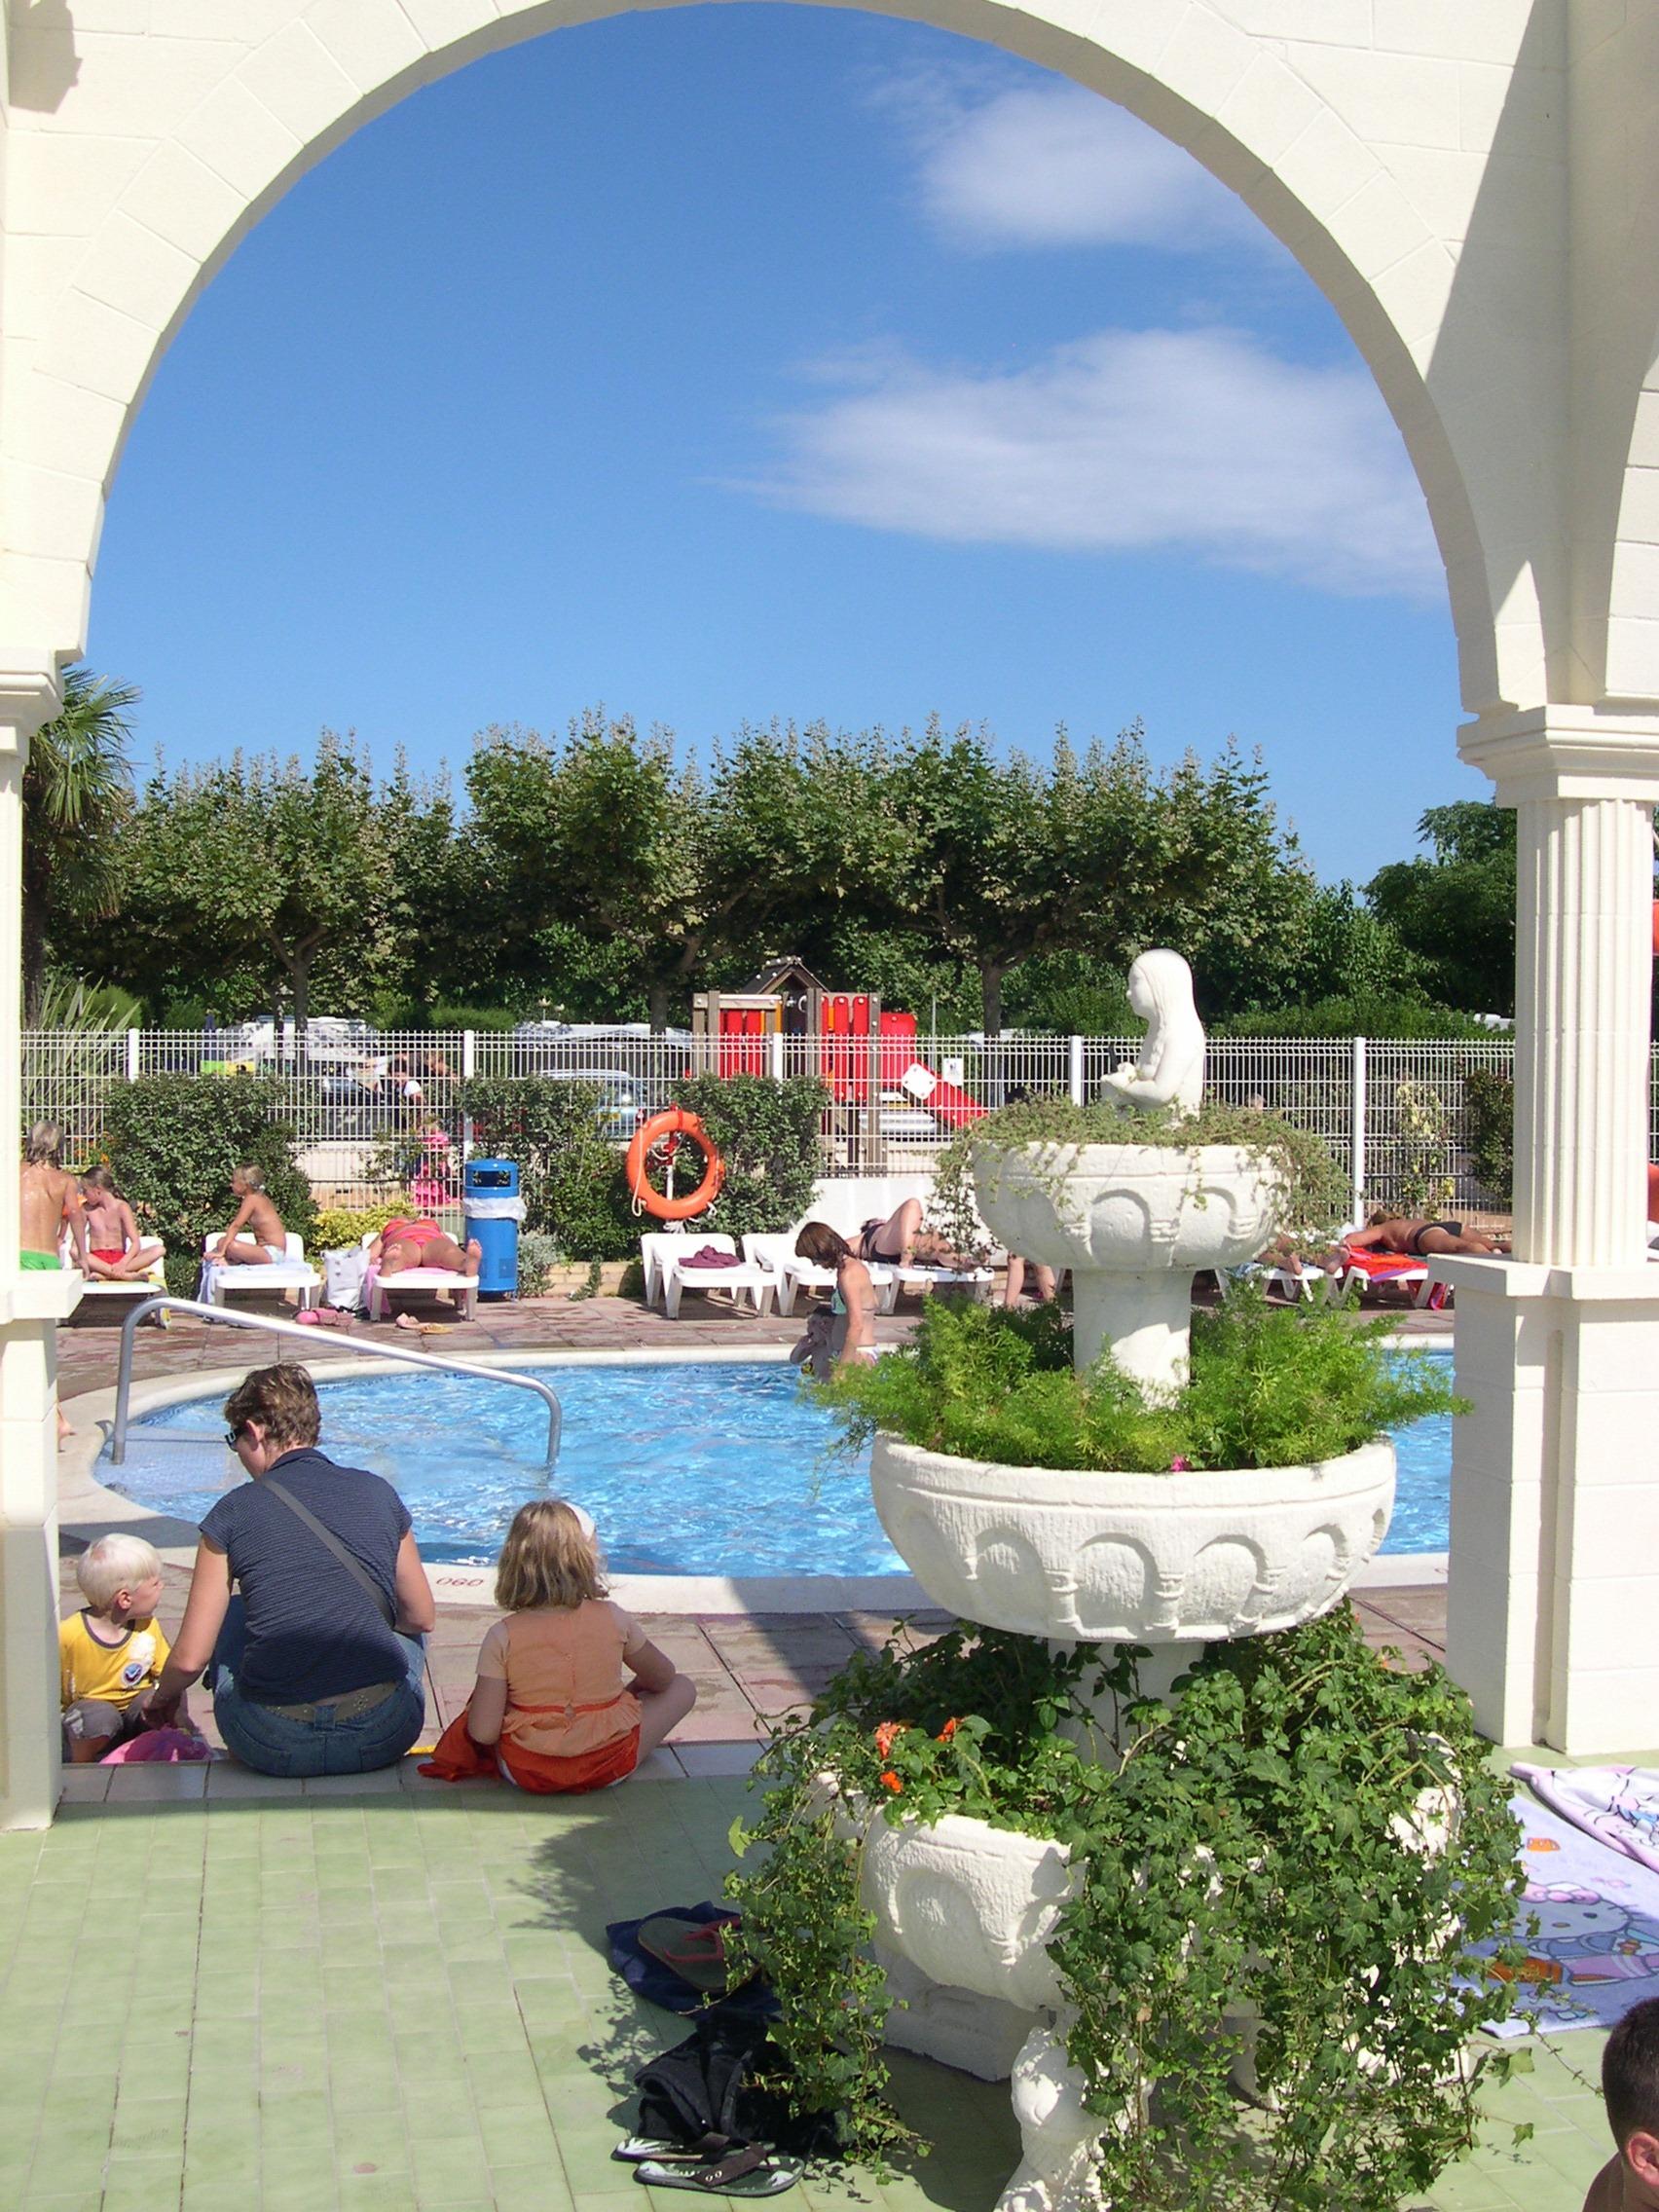 Foto playa Sant Pere Pescador. swimmingpool at campsite L´Amfora St. Pare Pescador